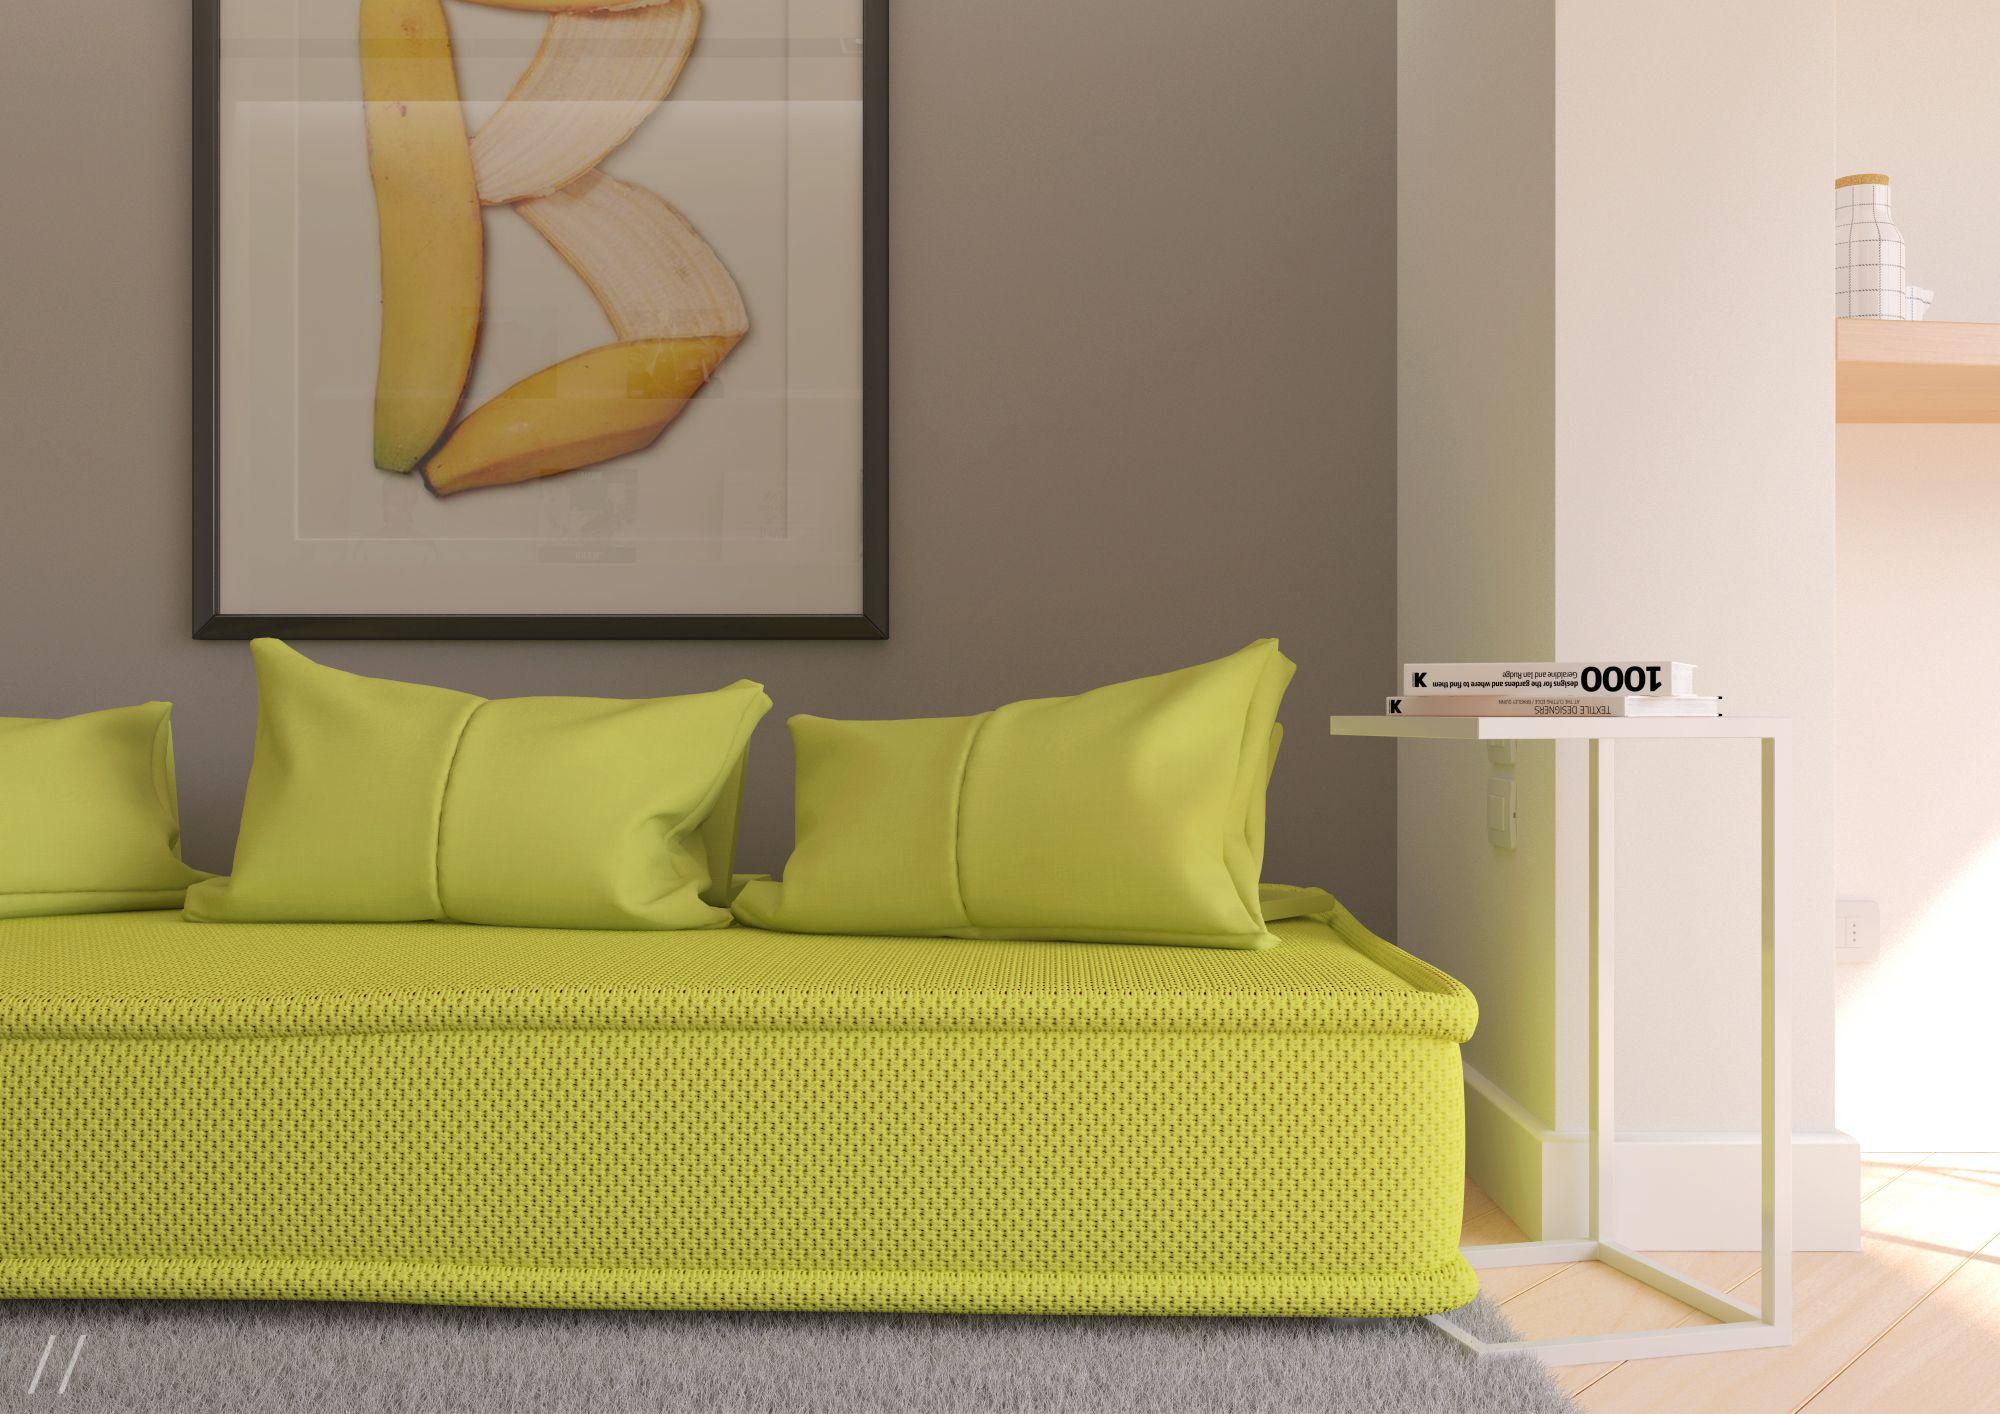 Escapade Roche Bobois Beau Image Livingroom Living Interior Design Rochebobois Escapade Couch